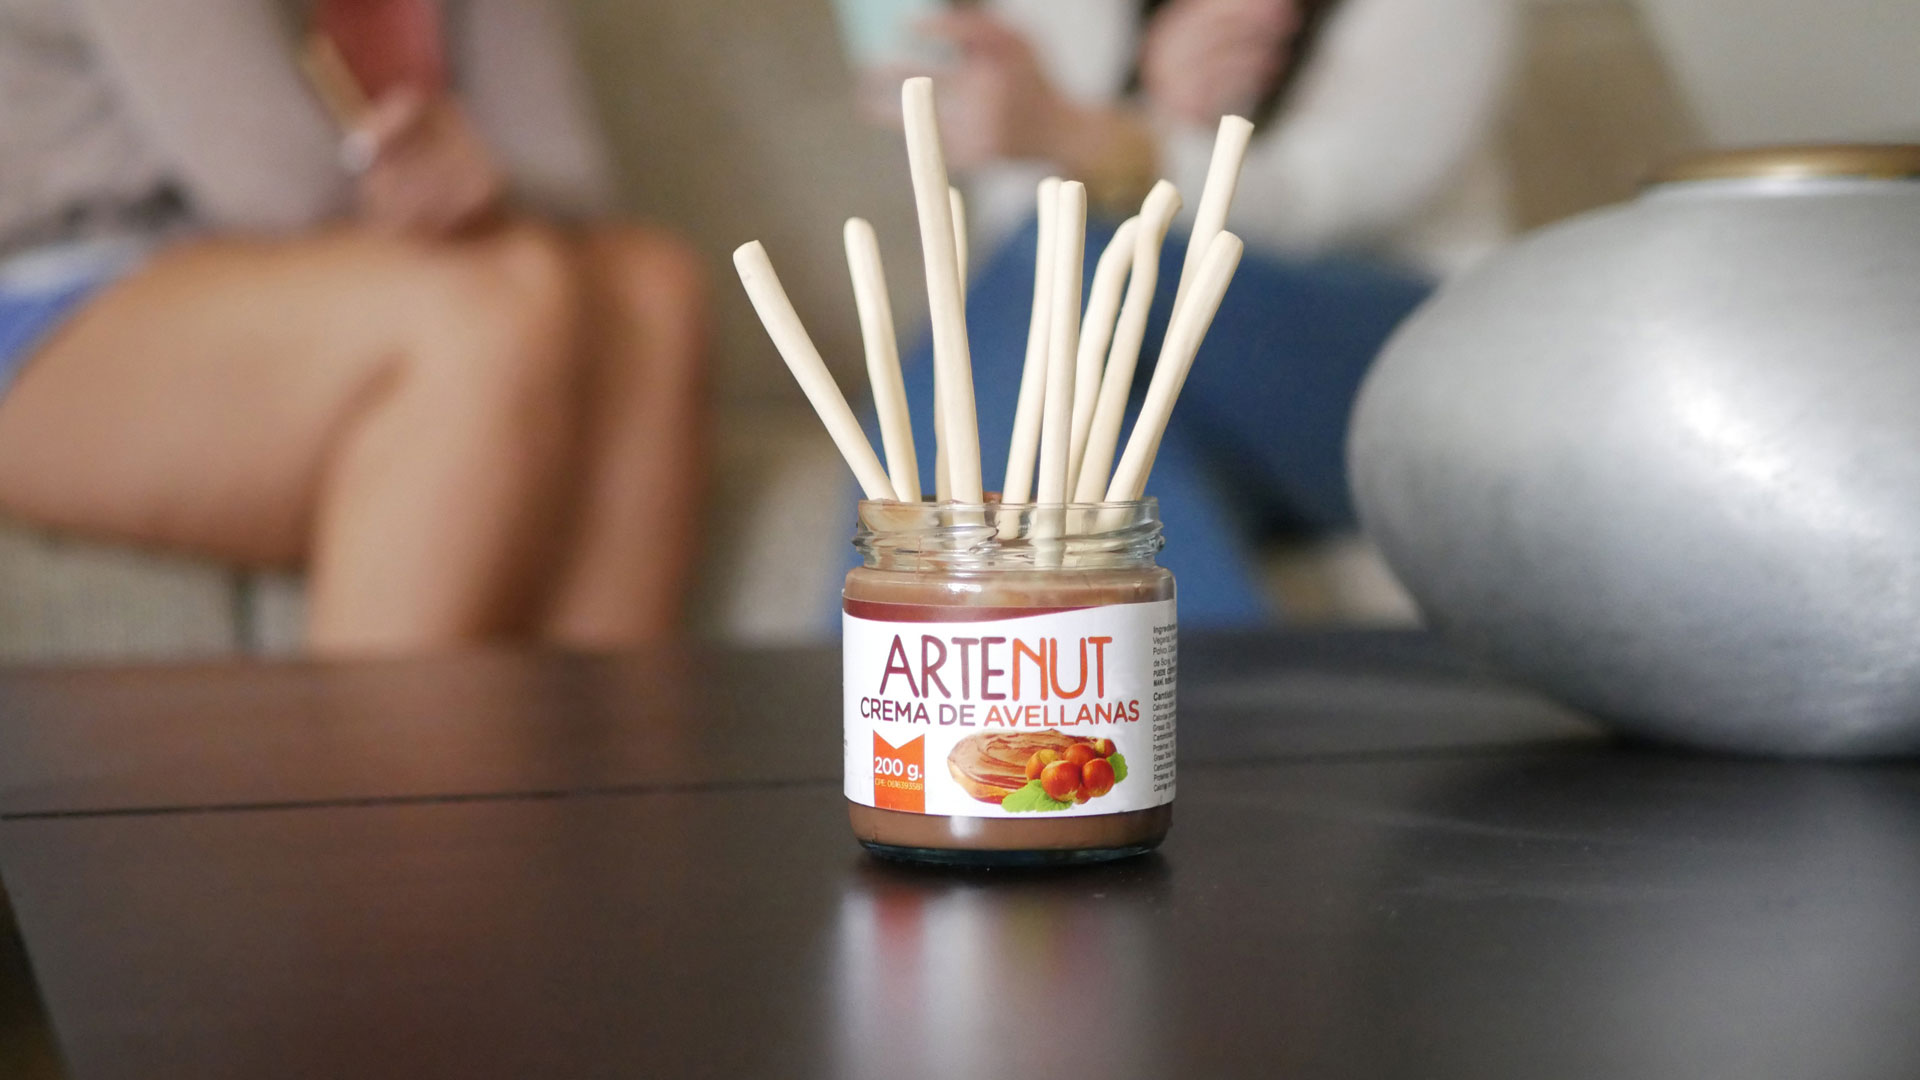 Artenut Crema de Avellanas de Artekao